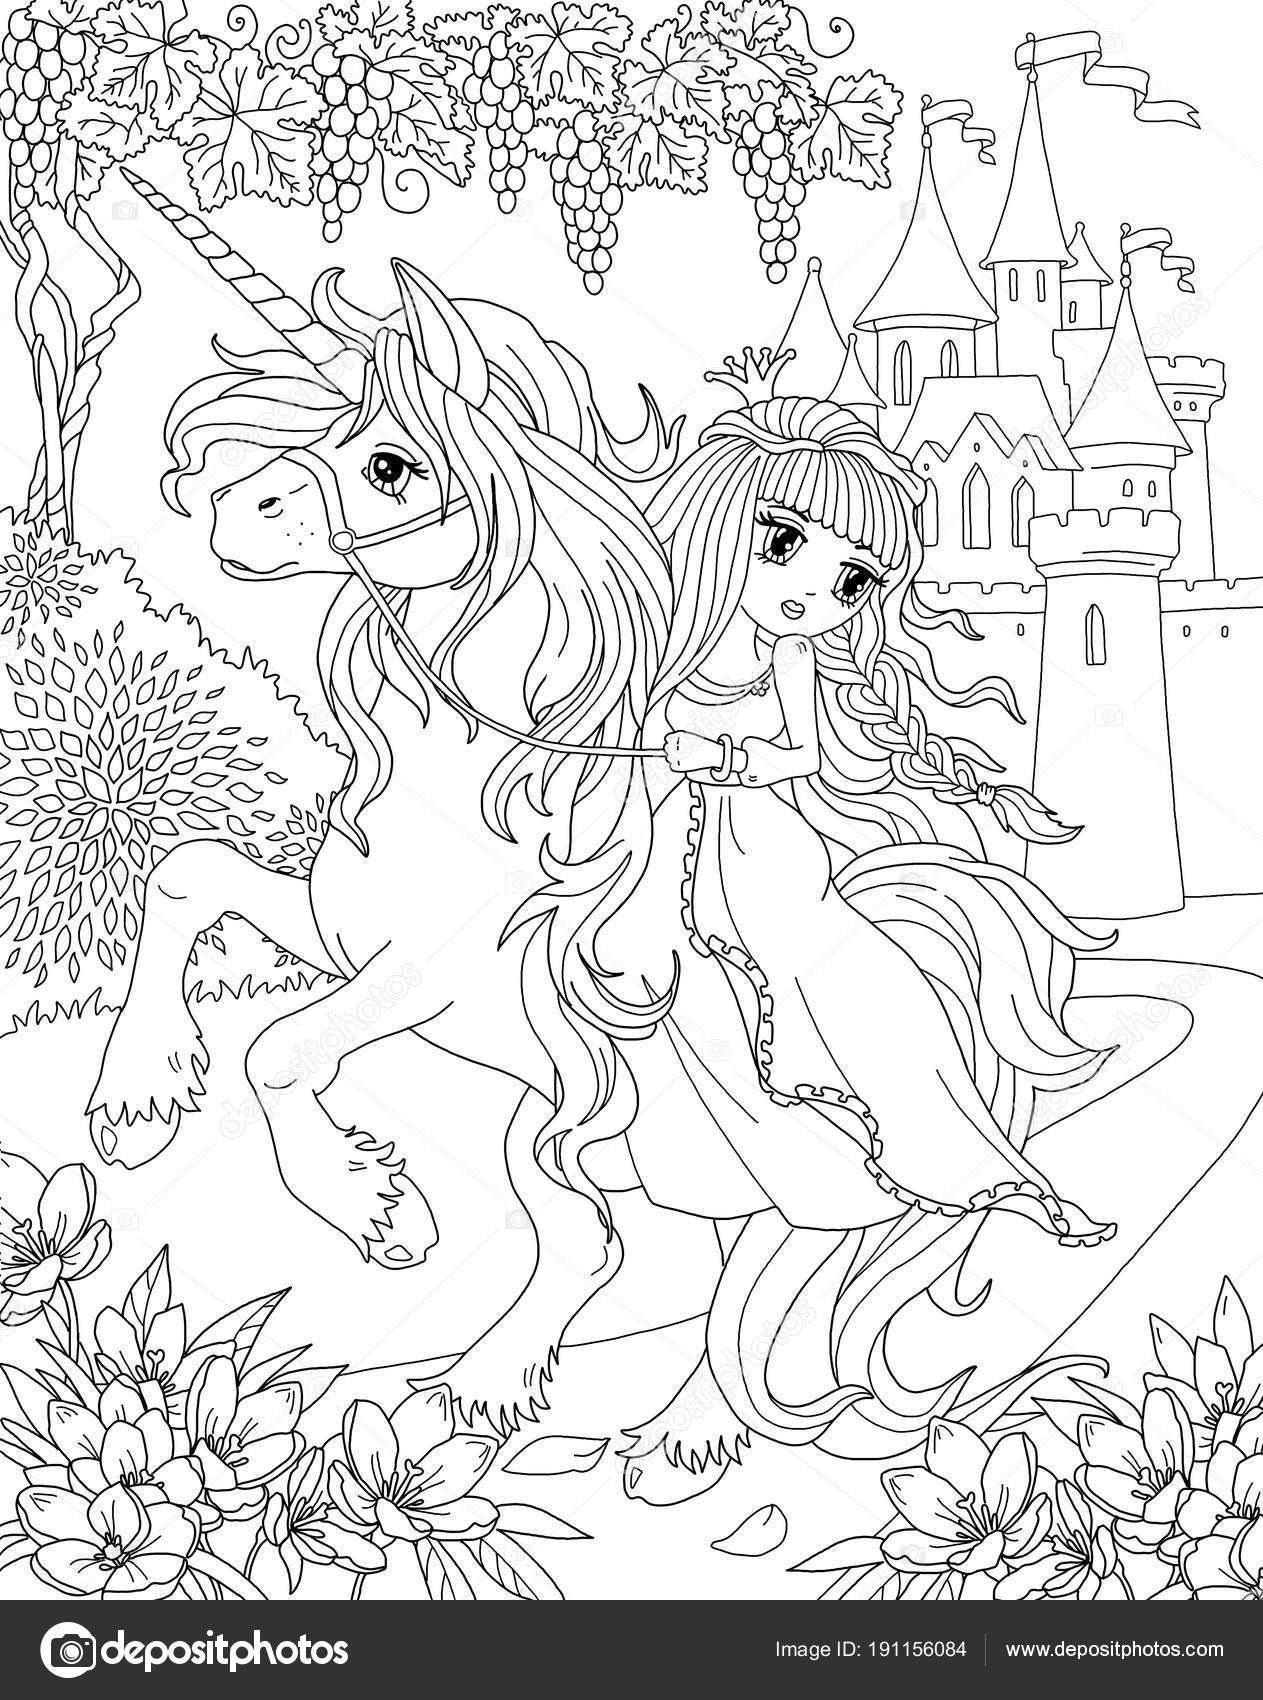 Beautiful Princess And Unicorn Coloring Page By Anna Velichkovsky Via Dreamstime Unicorn Coloring Pages Fairy Coloring Pages Fairy Coloring